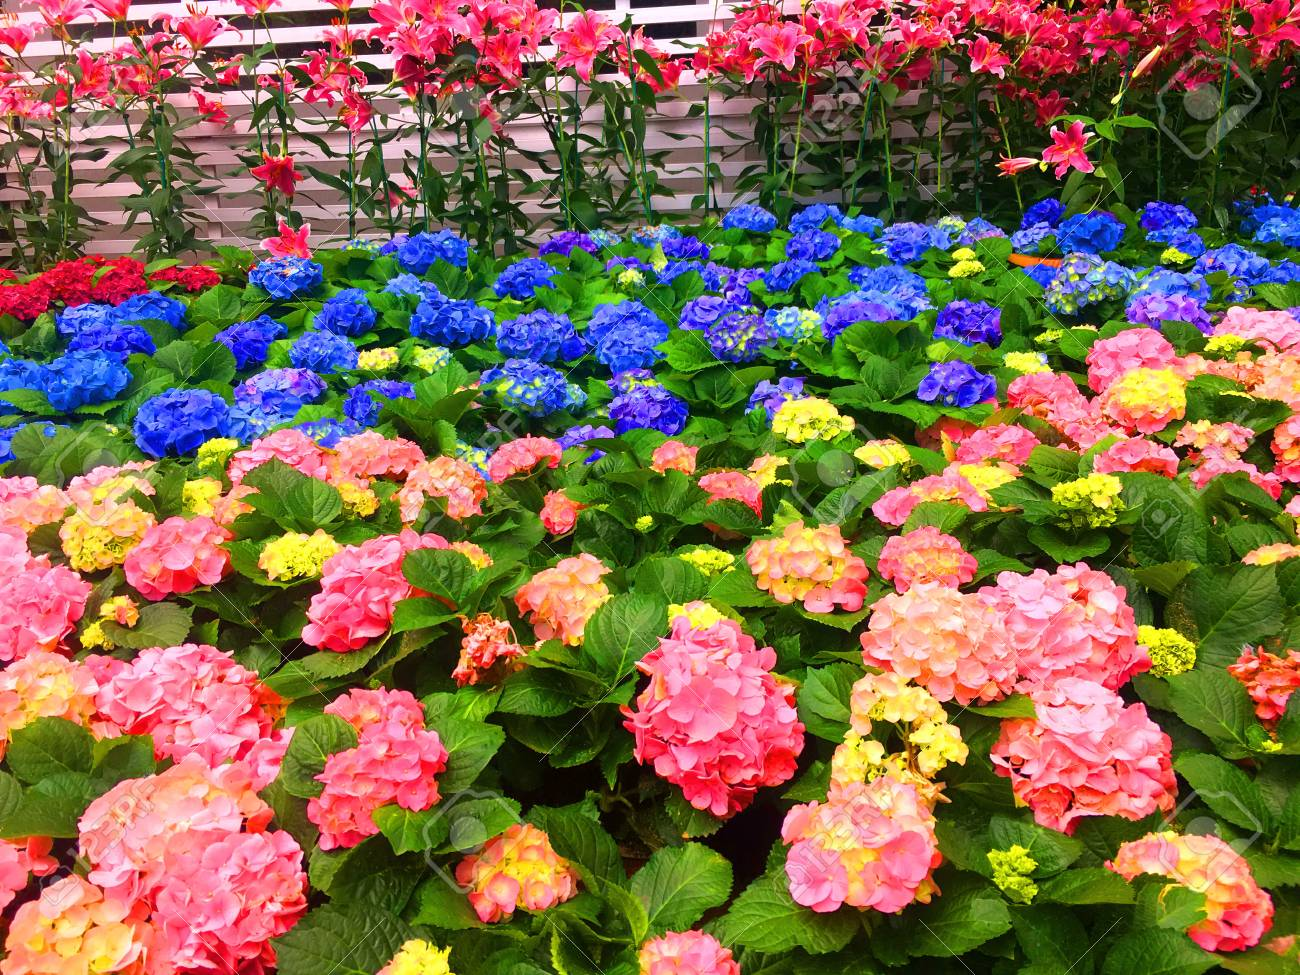 Begonia Flowers Full Blooming In Flower Garden For Background